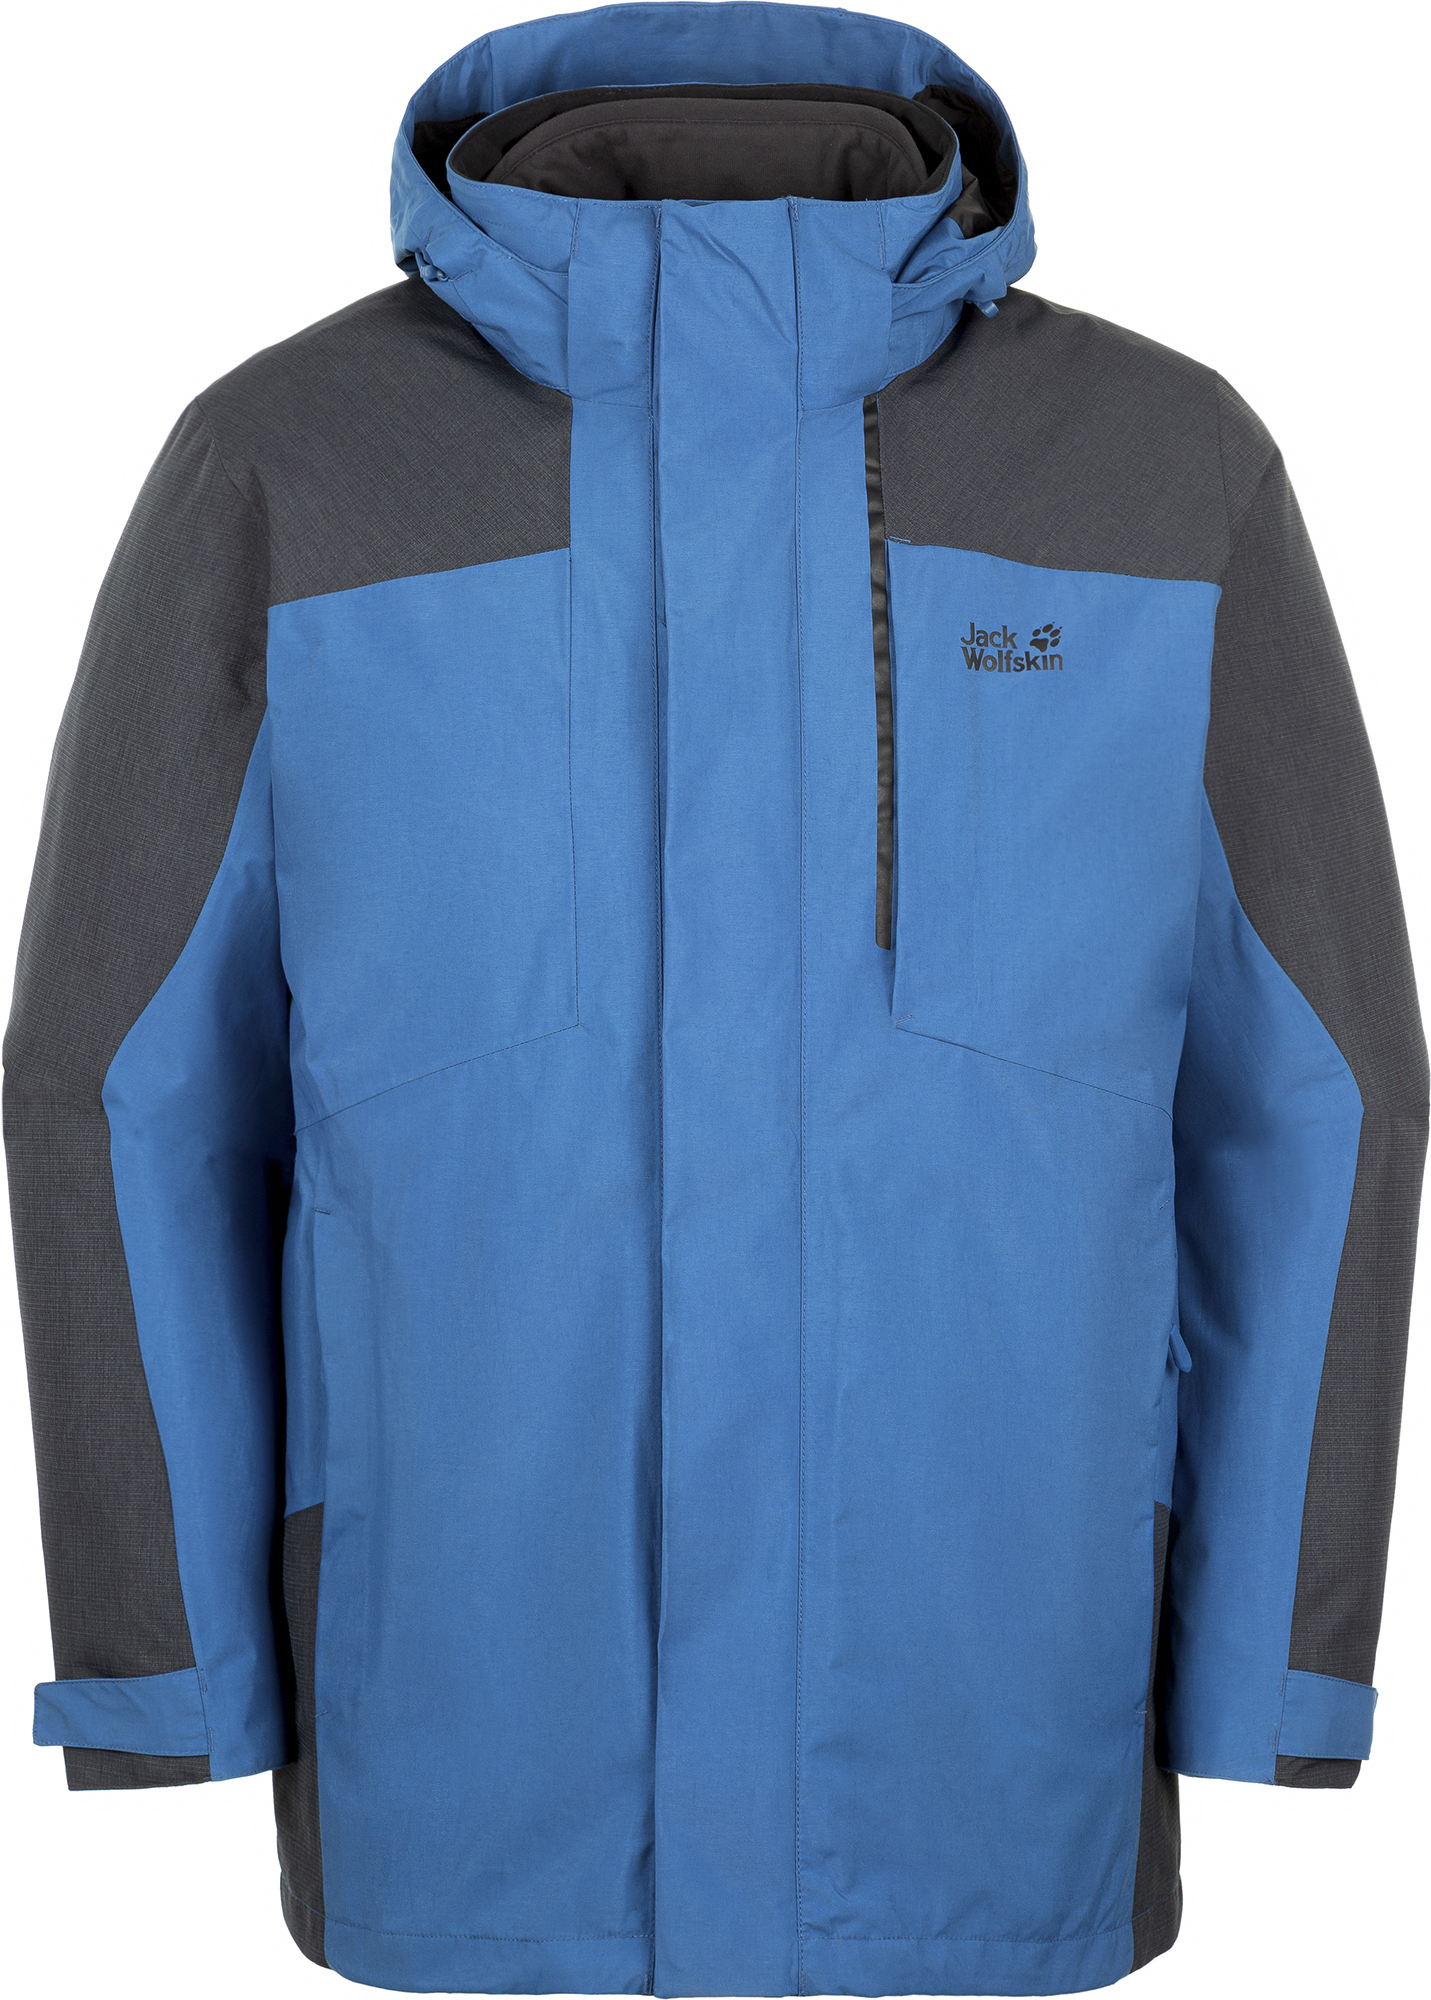 Jack Wolfskin Куртка 3 в 1 мужская Jack Wolfskin Viking, размер 58